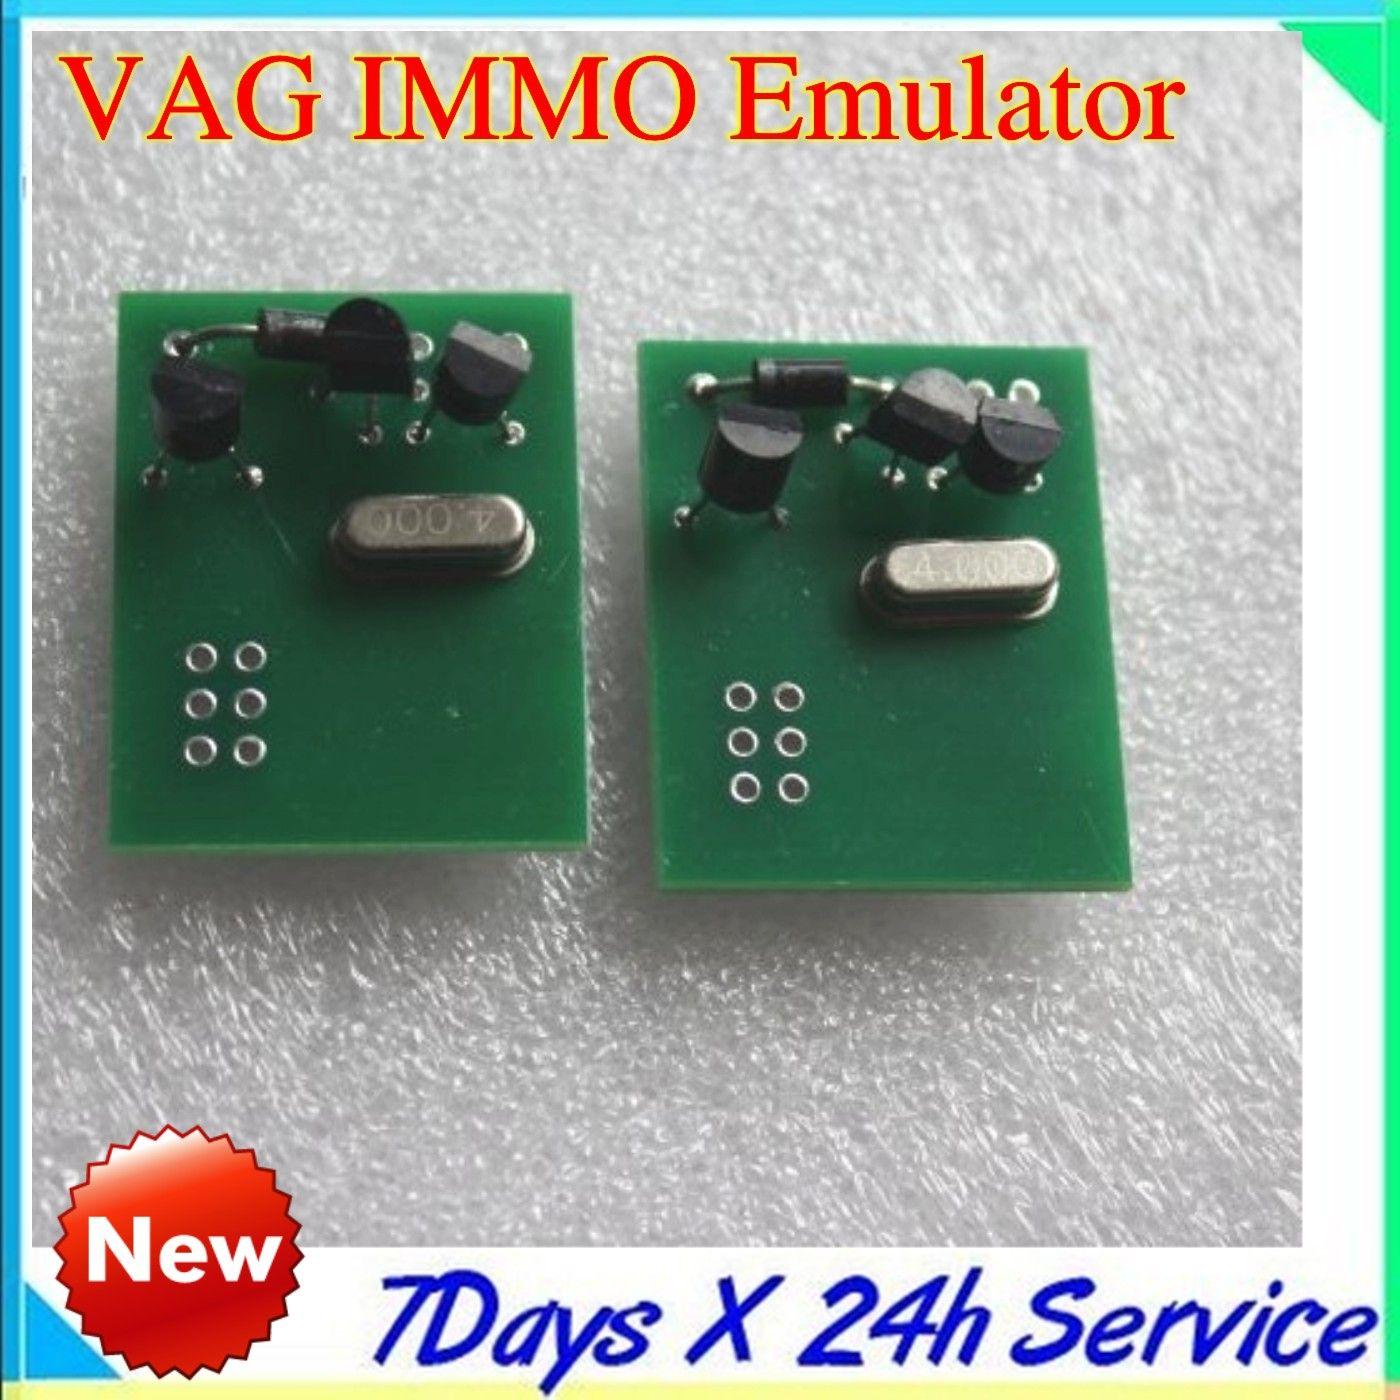 Vag immo эмулятор схема